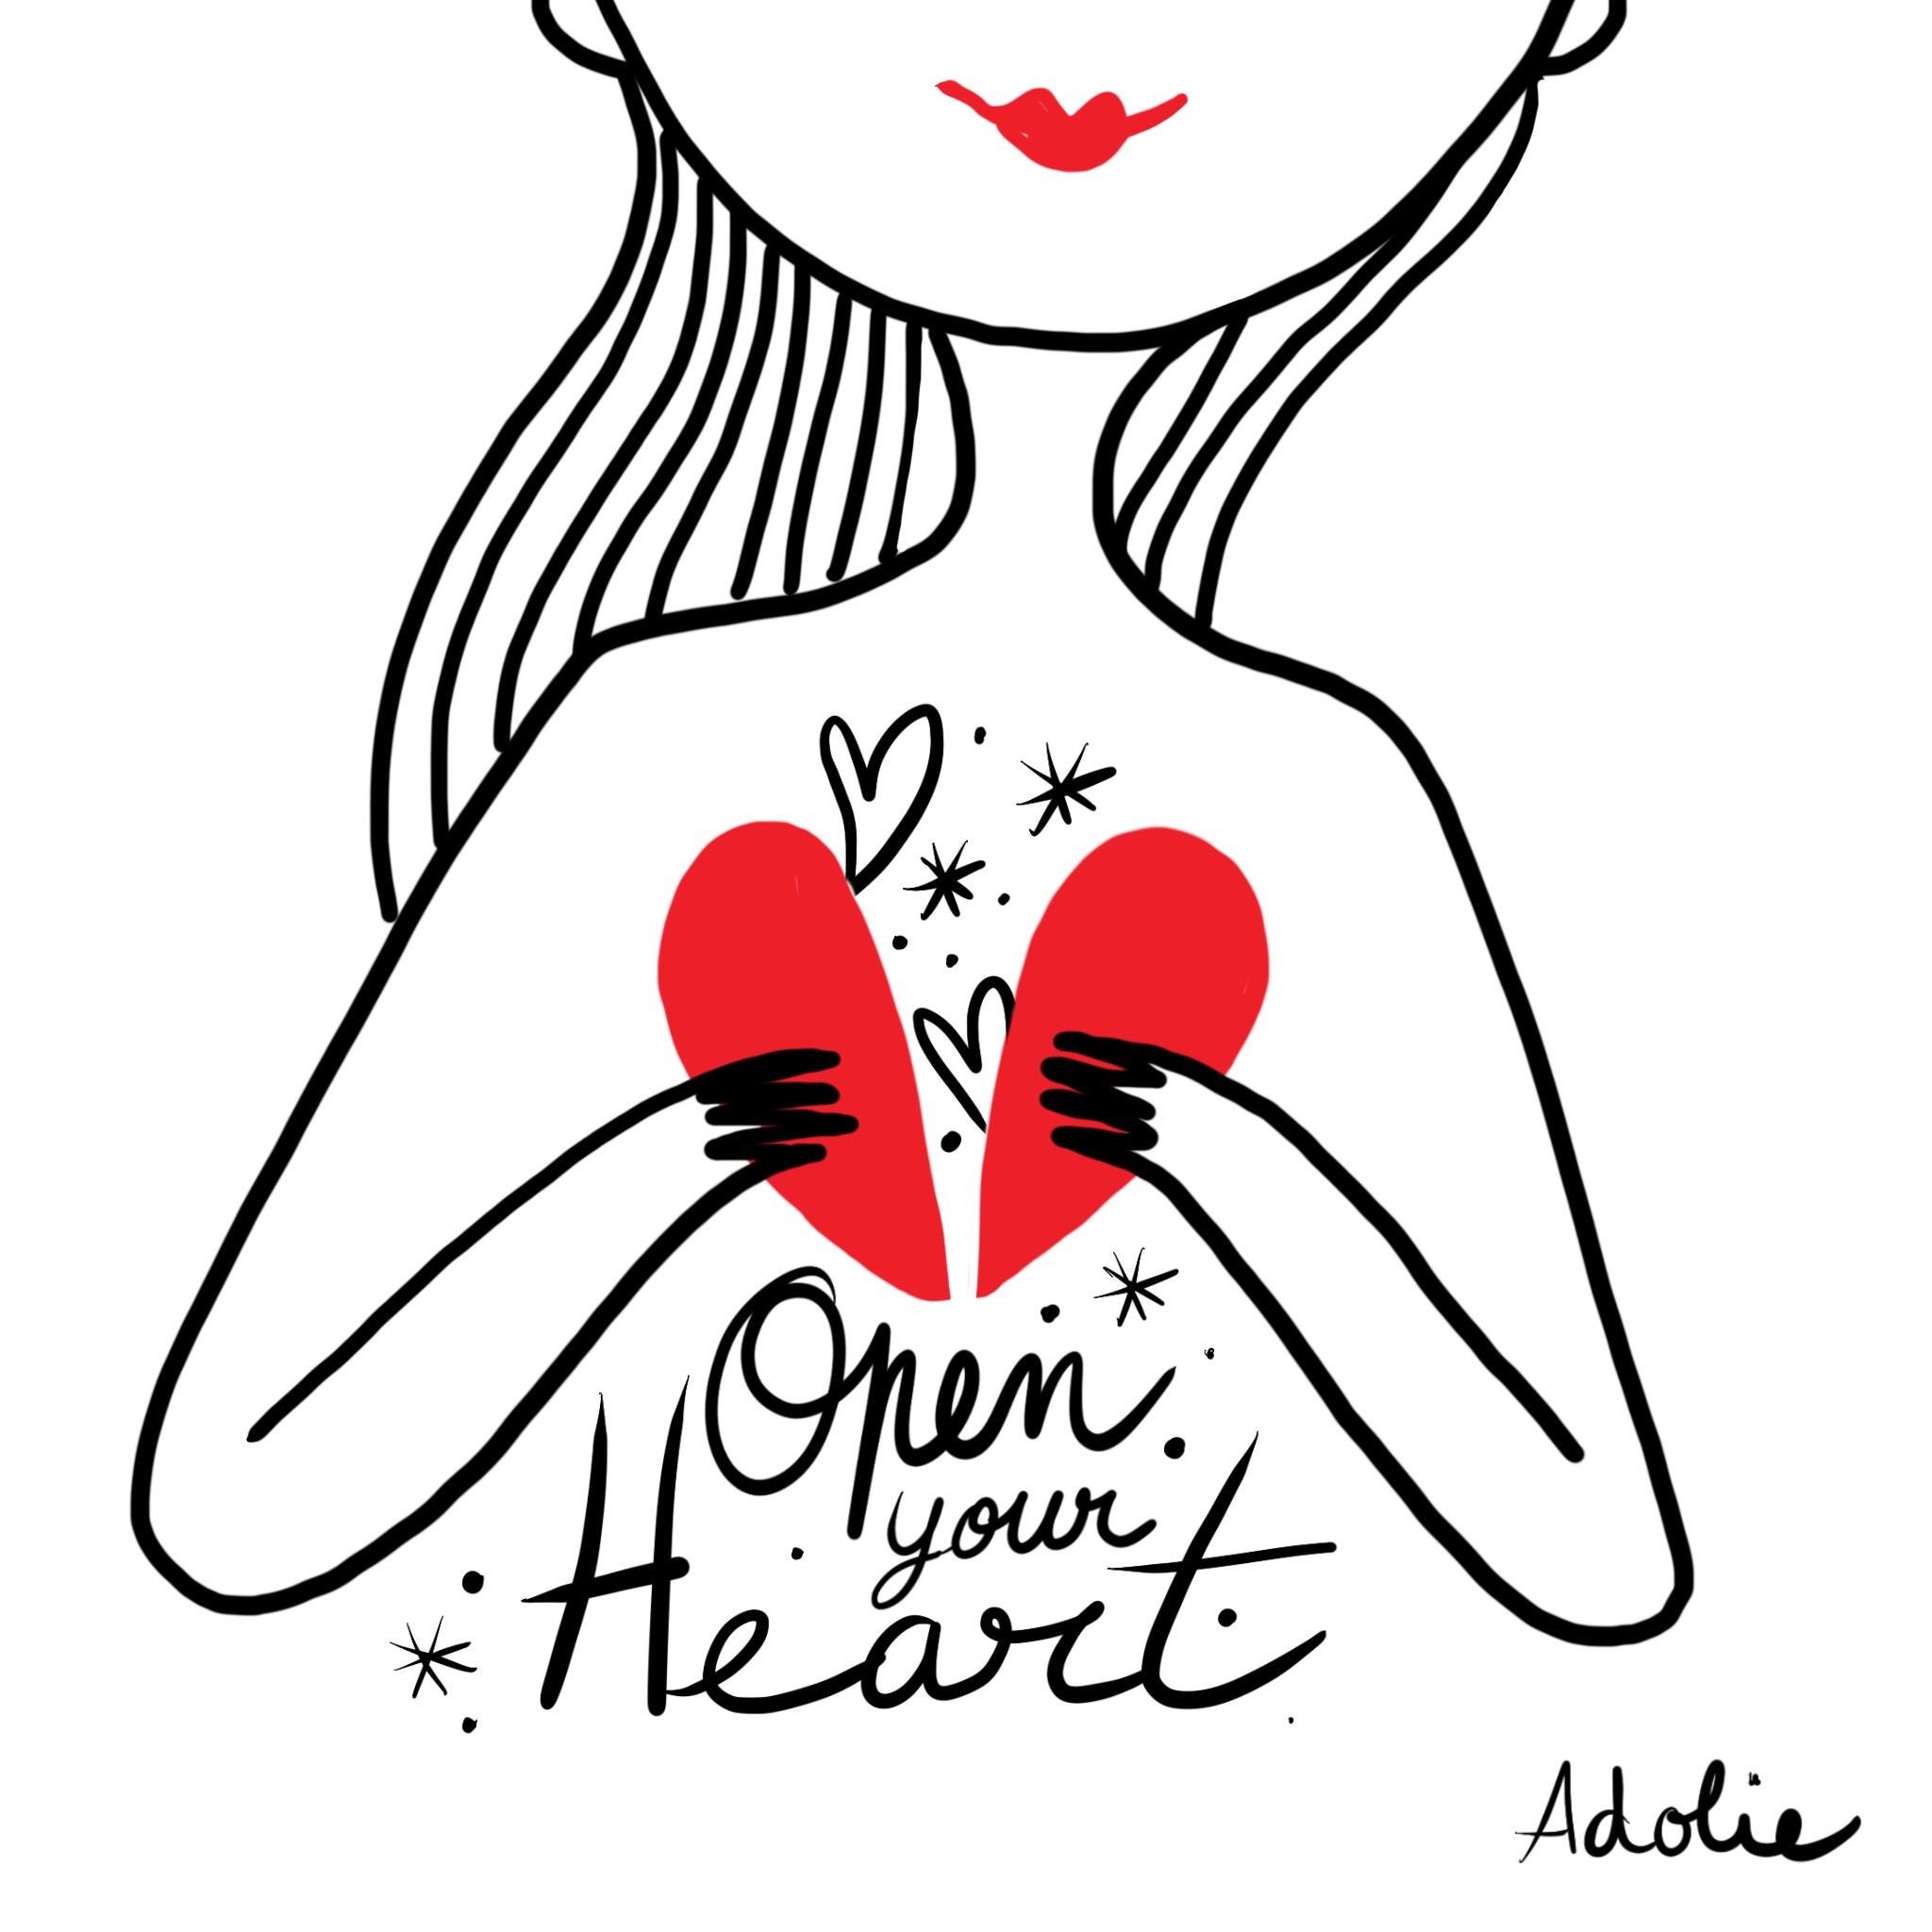 Adolie Day / Agence Marie Bastille